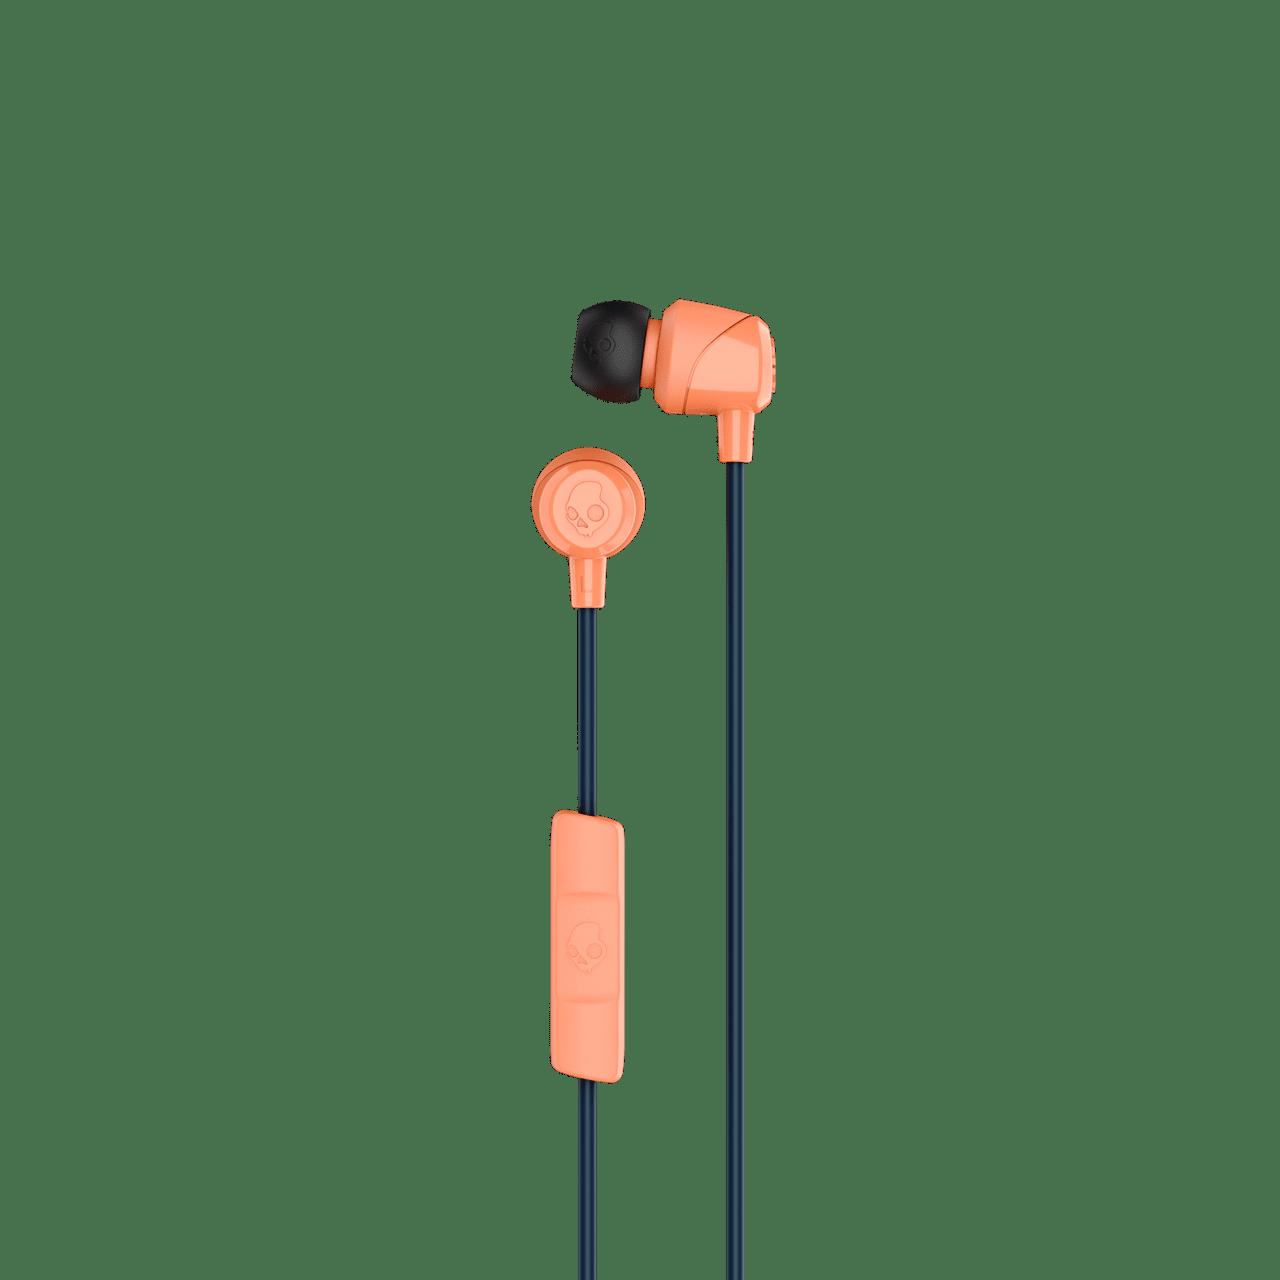 Skullcandy Jib Sunset/Black Earphones W/Mic - 2